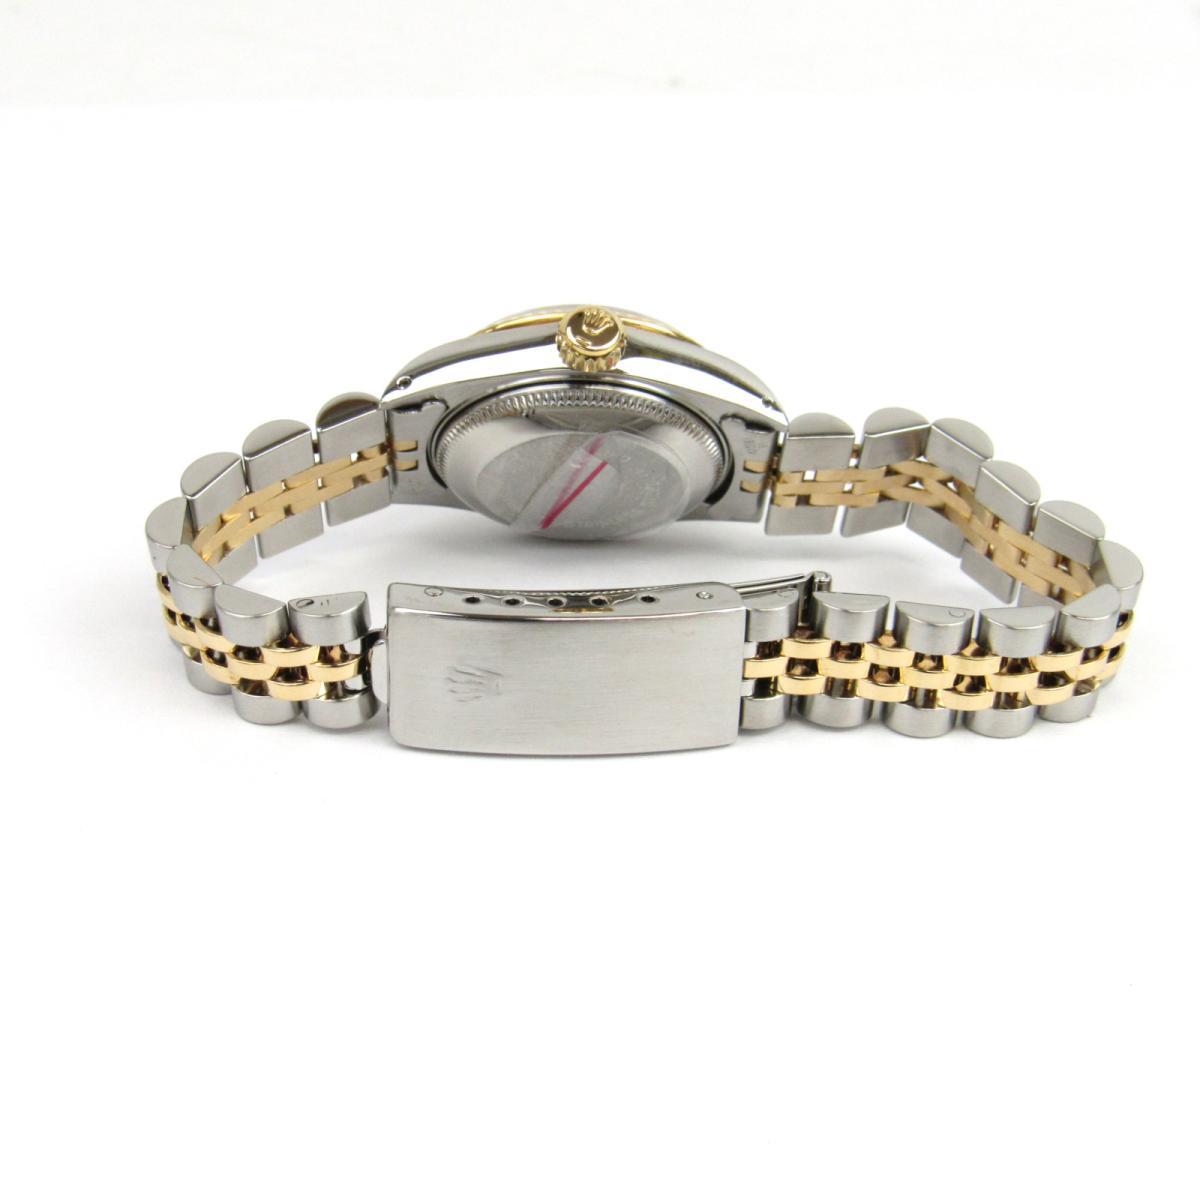 ROLEX 時計 69173 82番 デイトジャスト ウォッチ 腕時計